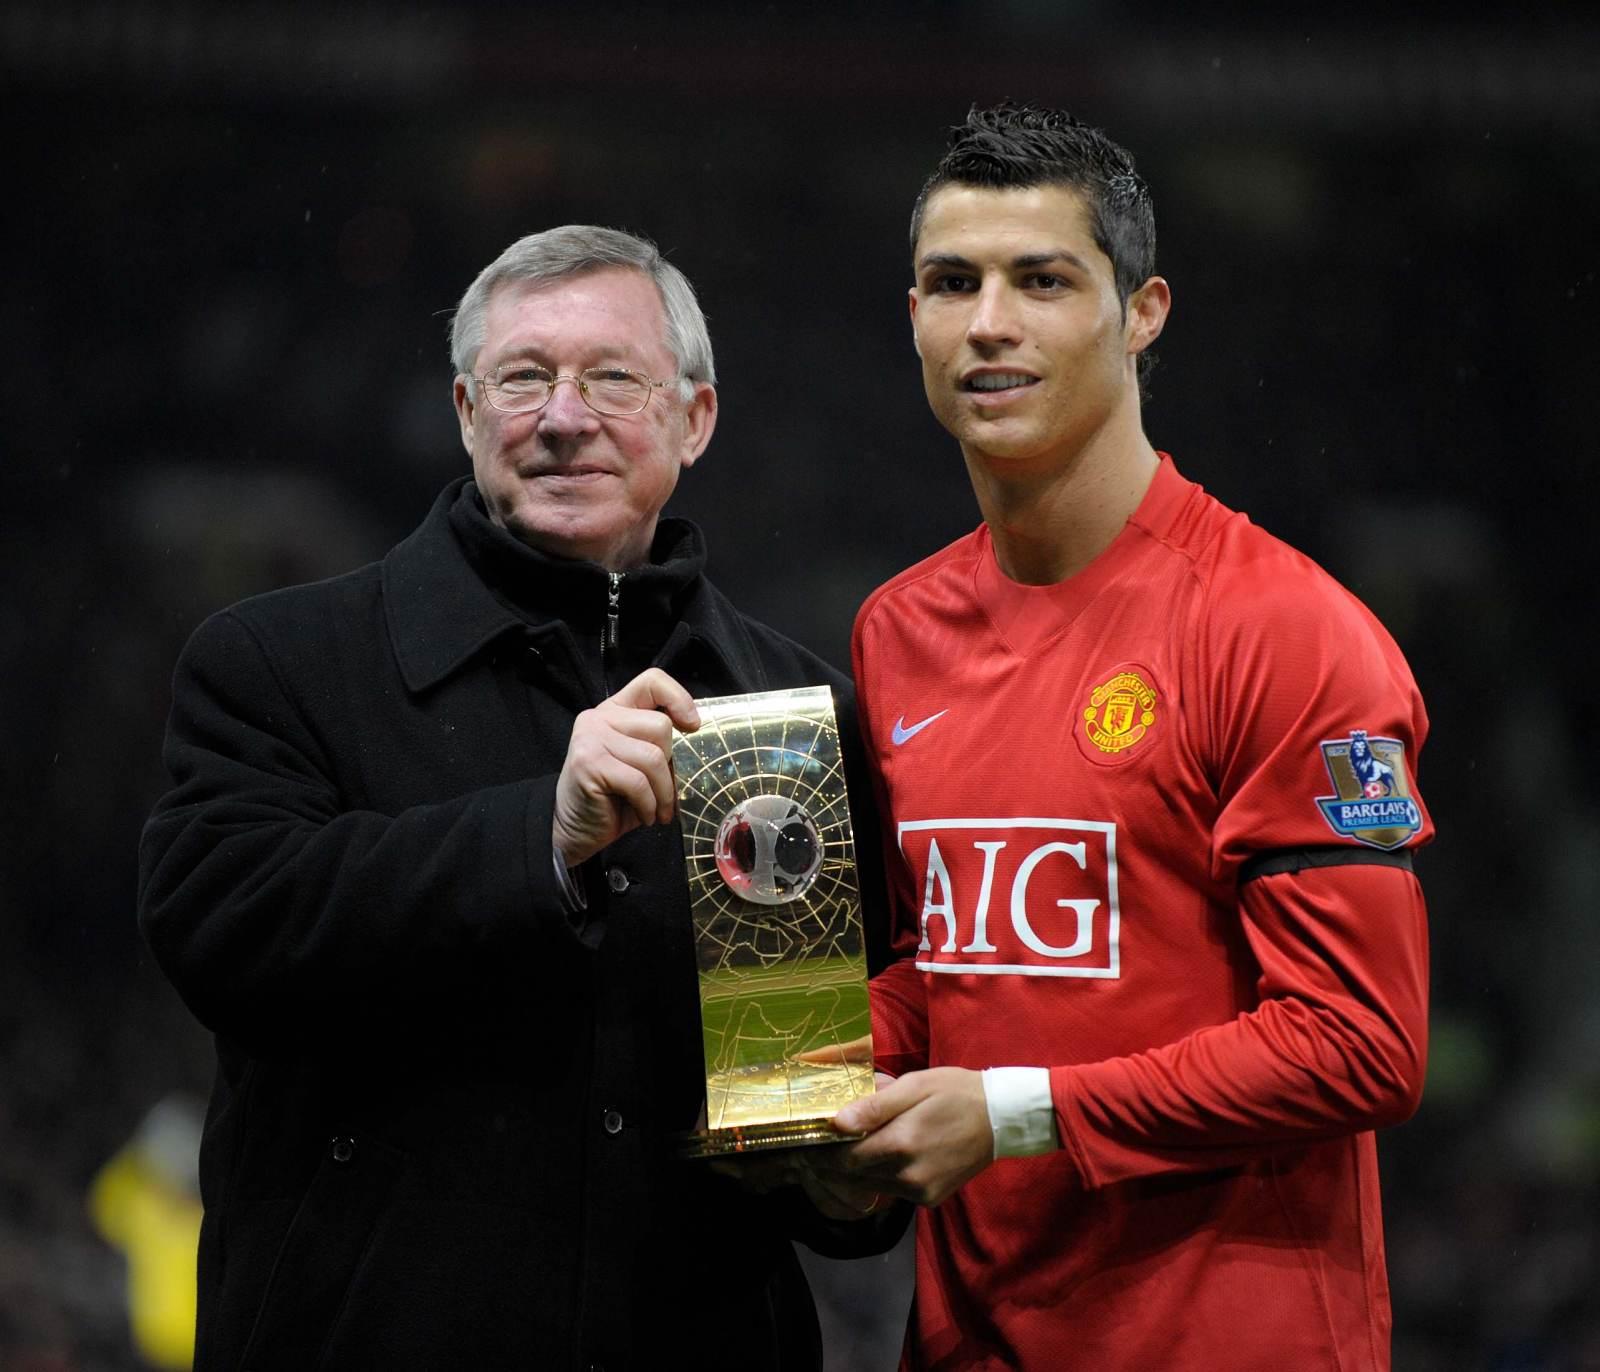 Дубль Роналду принёс победу «МЮ», «Манчестер Сити» и «Арсенал» также набрали по 3 очка